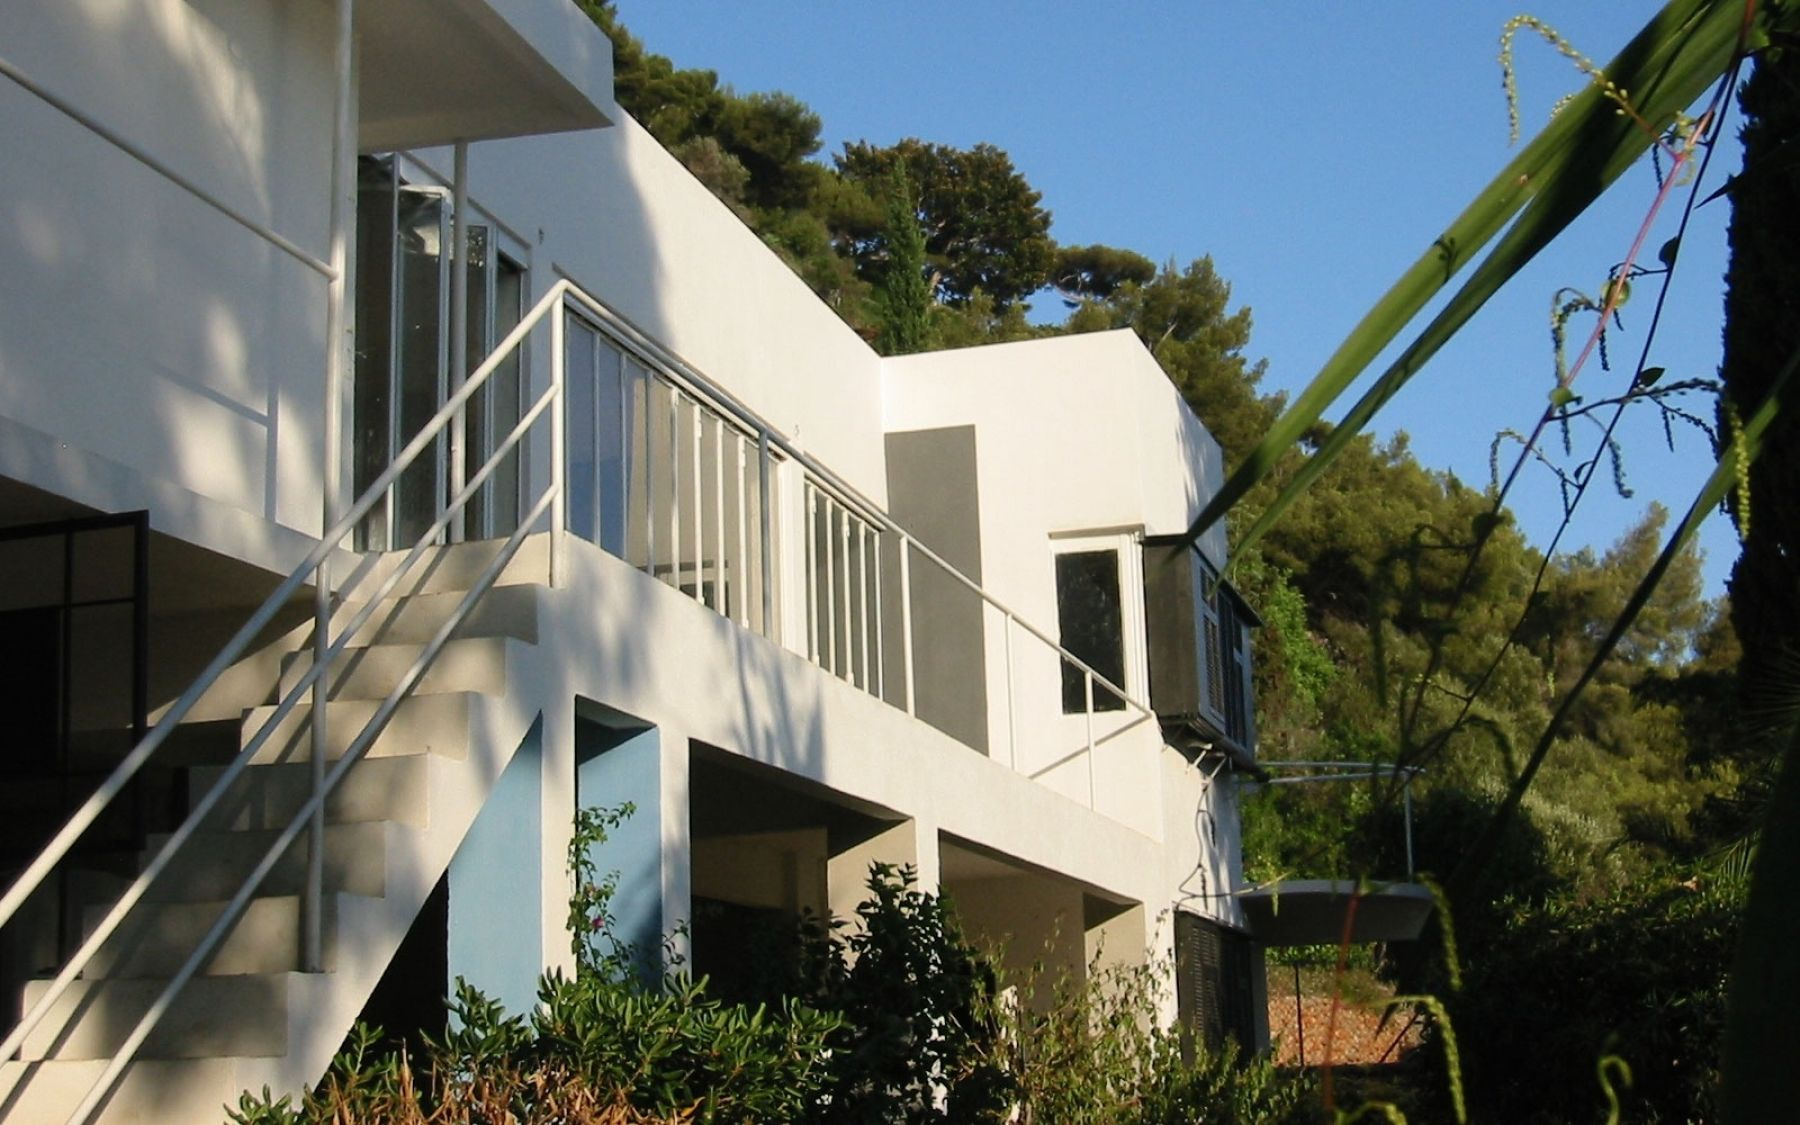 Resultado de imagem para la villa e-1027 villa 5 Villas to Discover in France 4f0f2e94820107cb774451ef265cb7d5